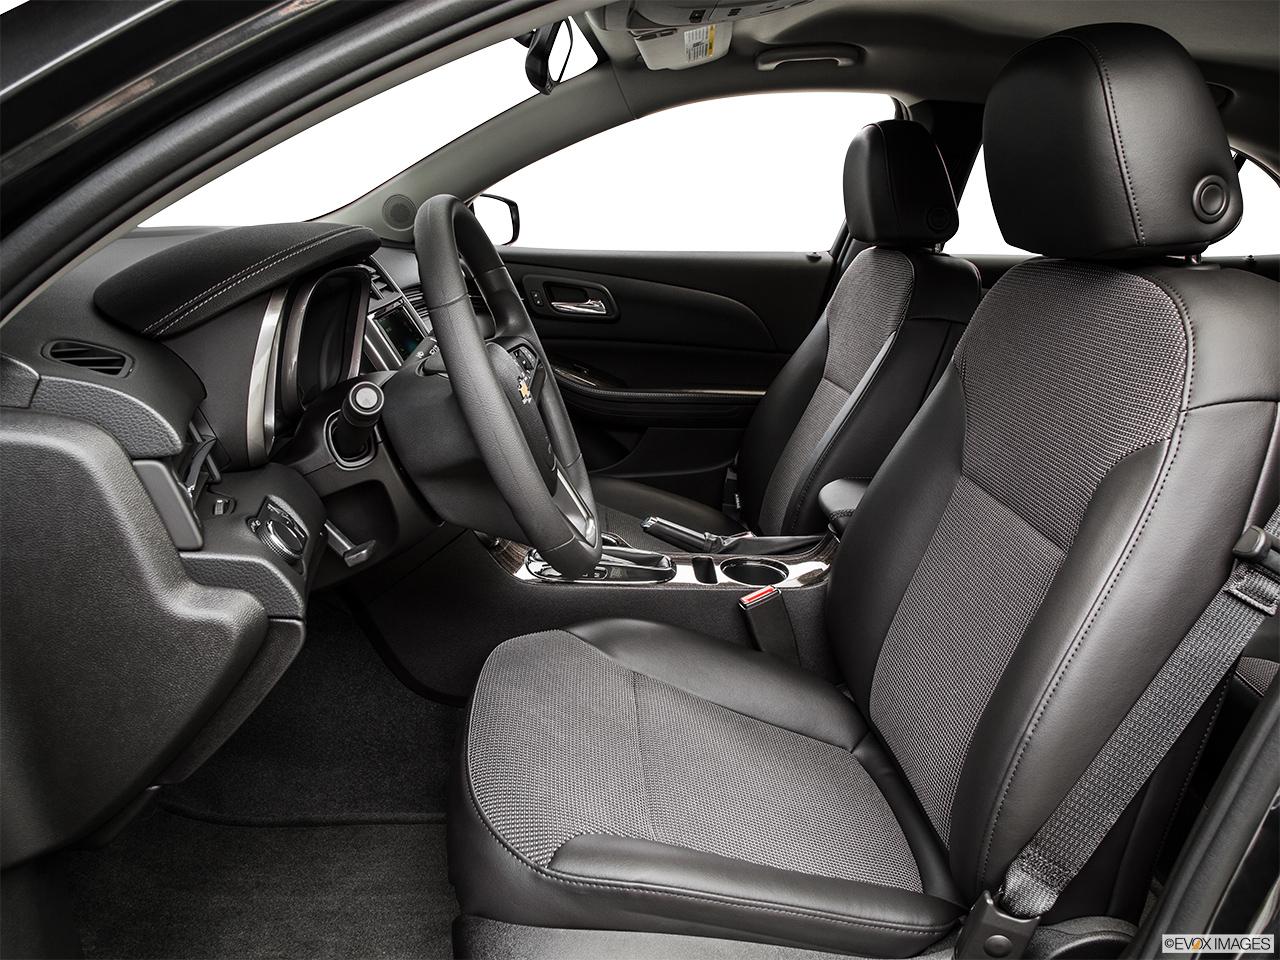 2015 Chevrolet Malibu Lt W3lt Sedan Front Angle View 2015